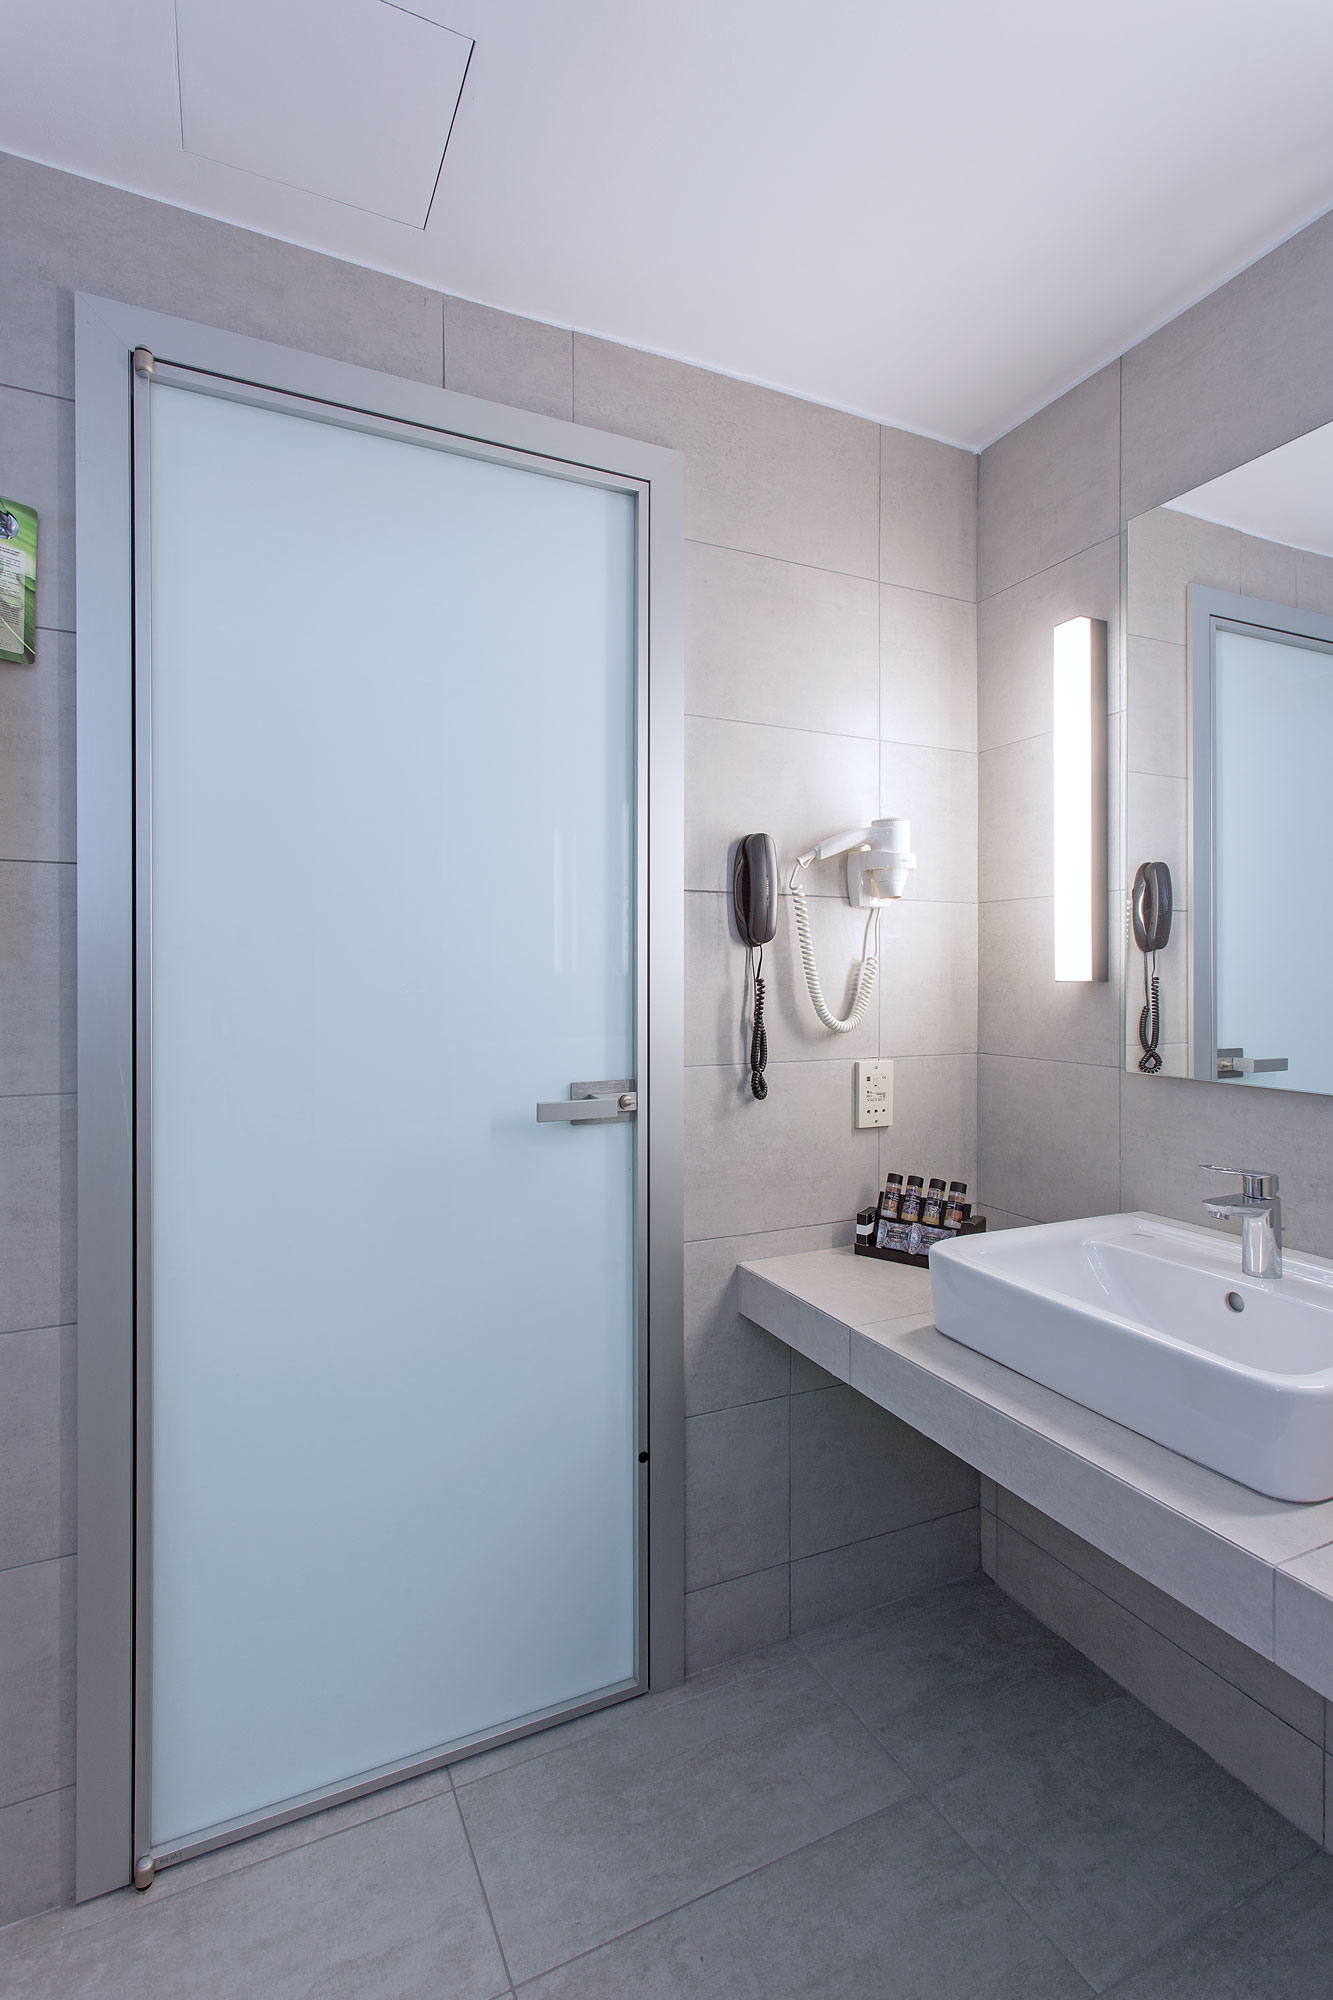 INTERNAL DOOR MINIMAL WITH ALUMINUM FRAME & WHITE GLASS,